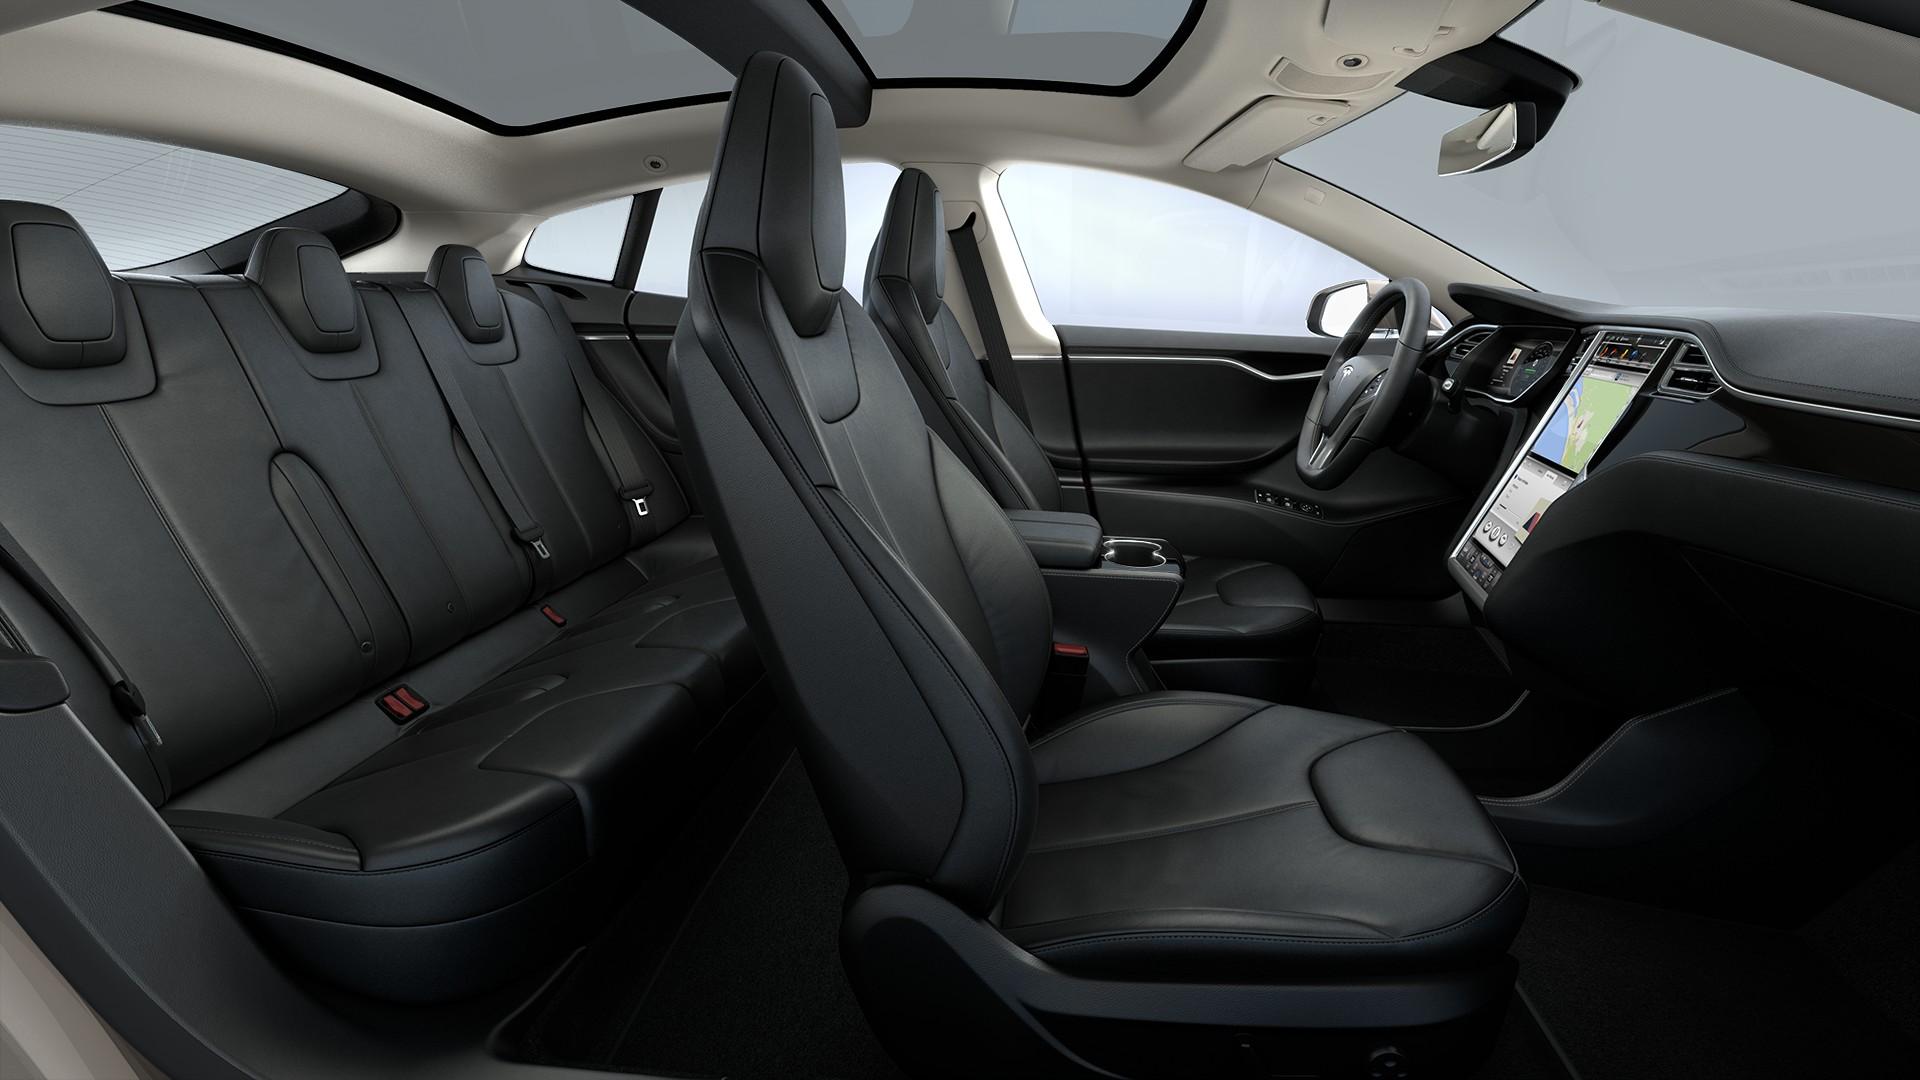 Interieur Black Nappa Leather Seats Piano Black Decor Standard Textile Headliner